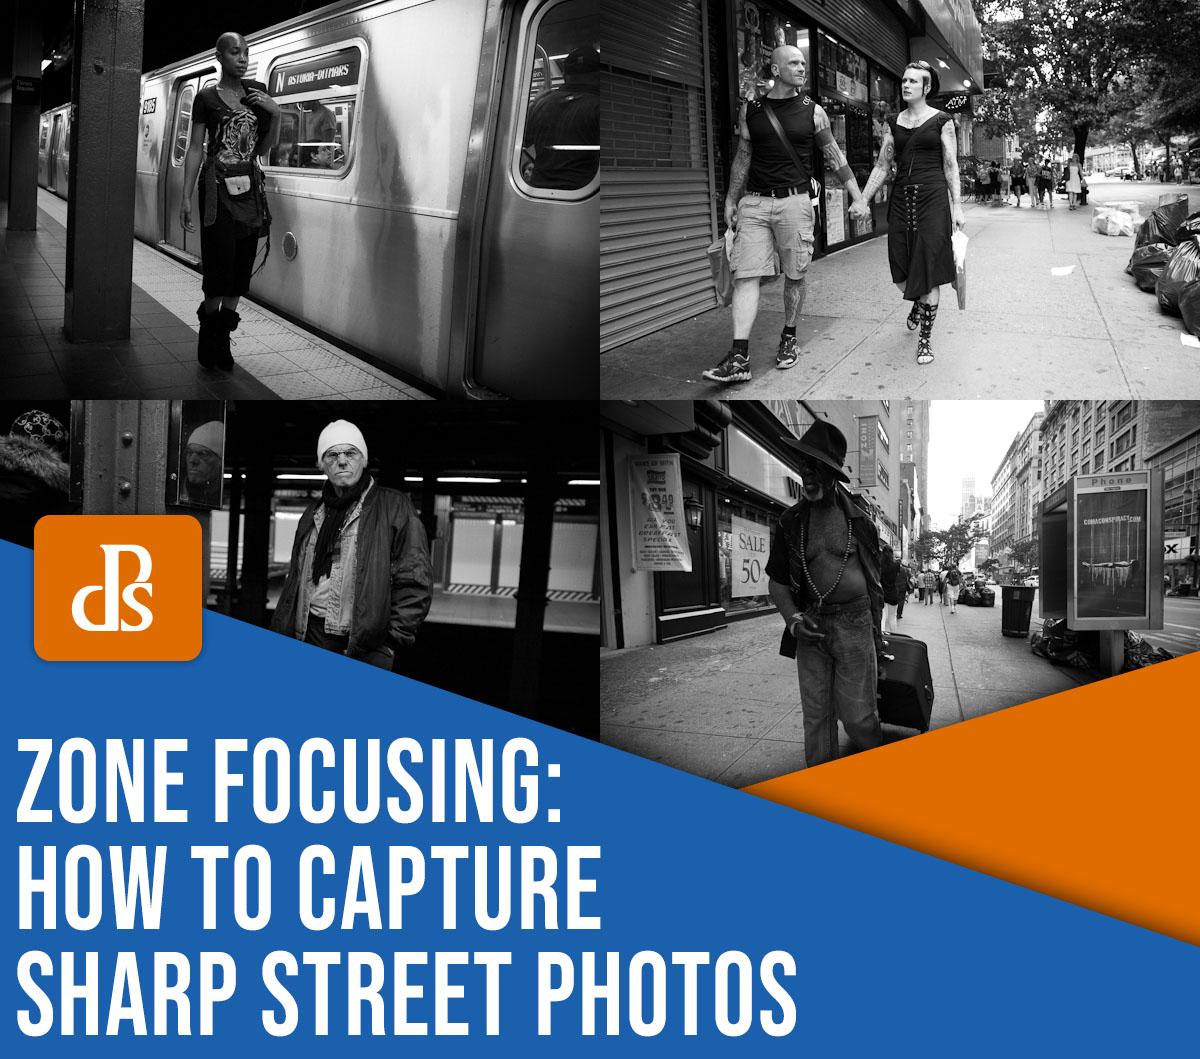 zone focusing: how to capture sharp street photos